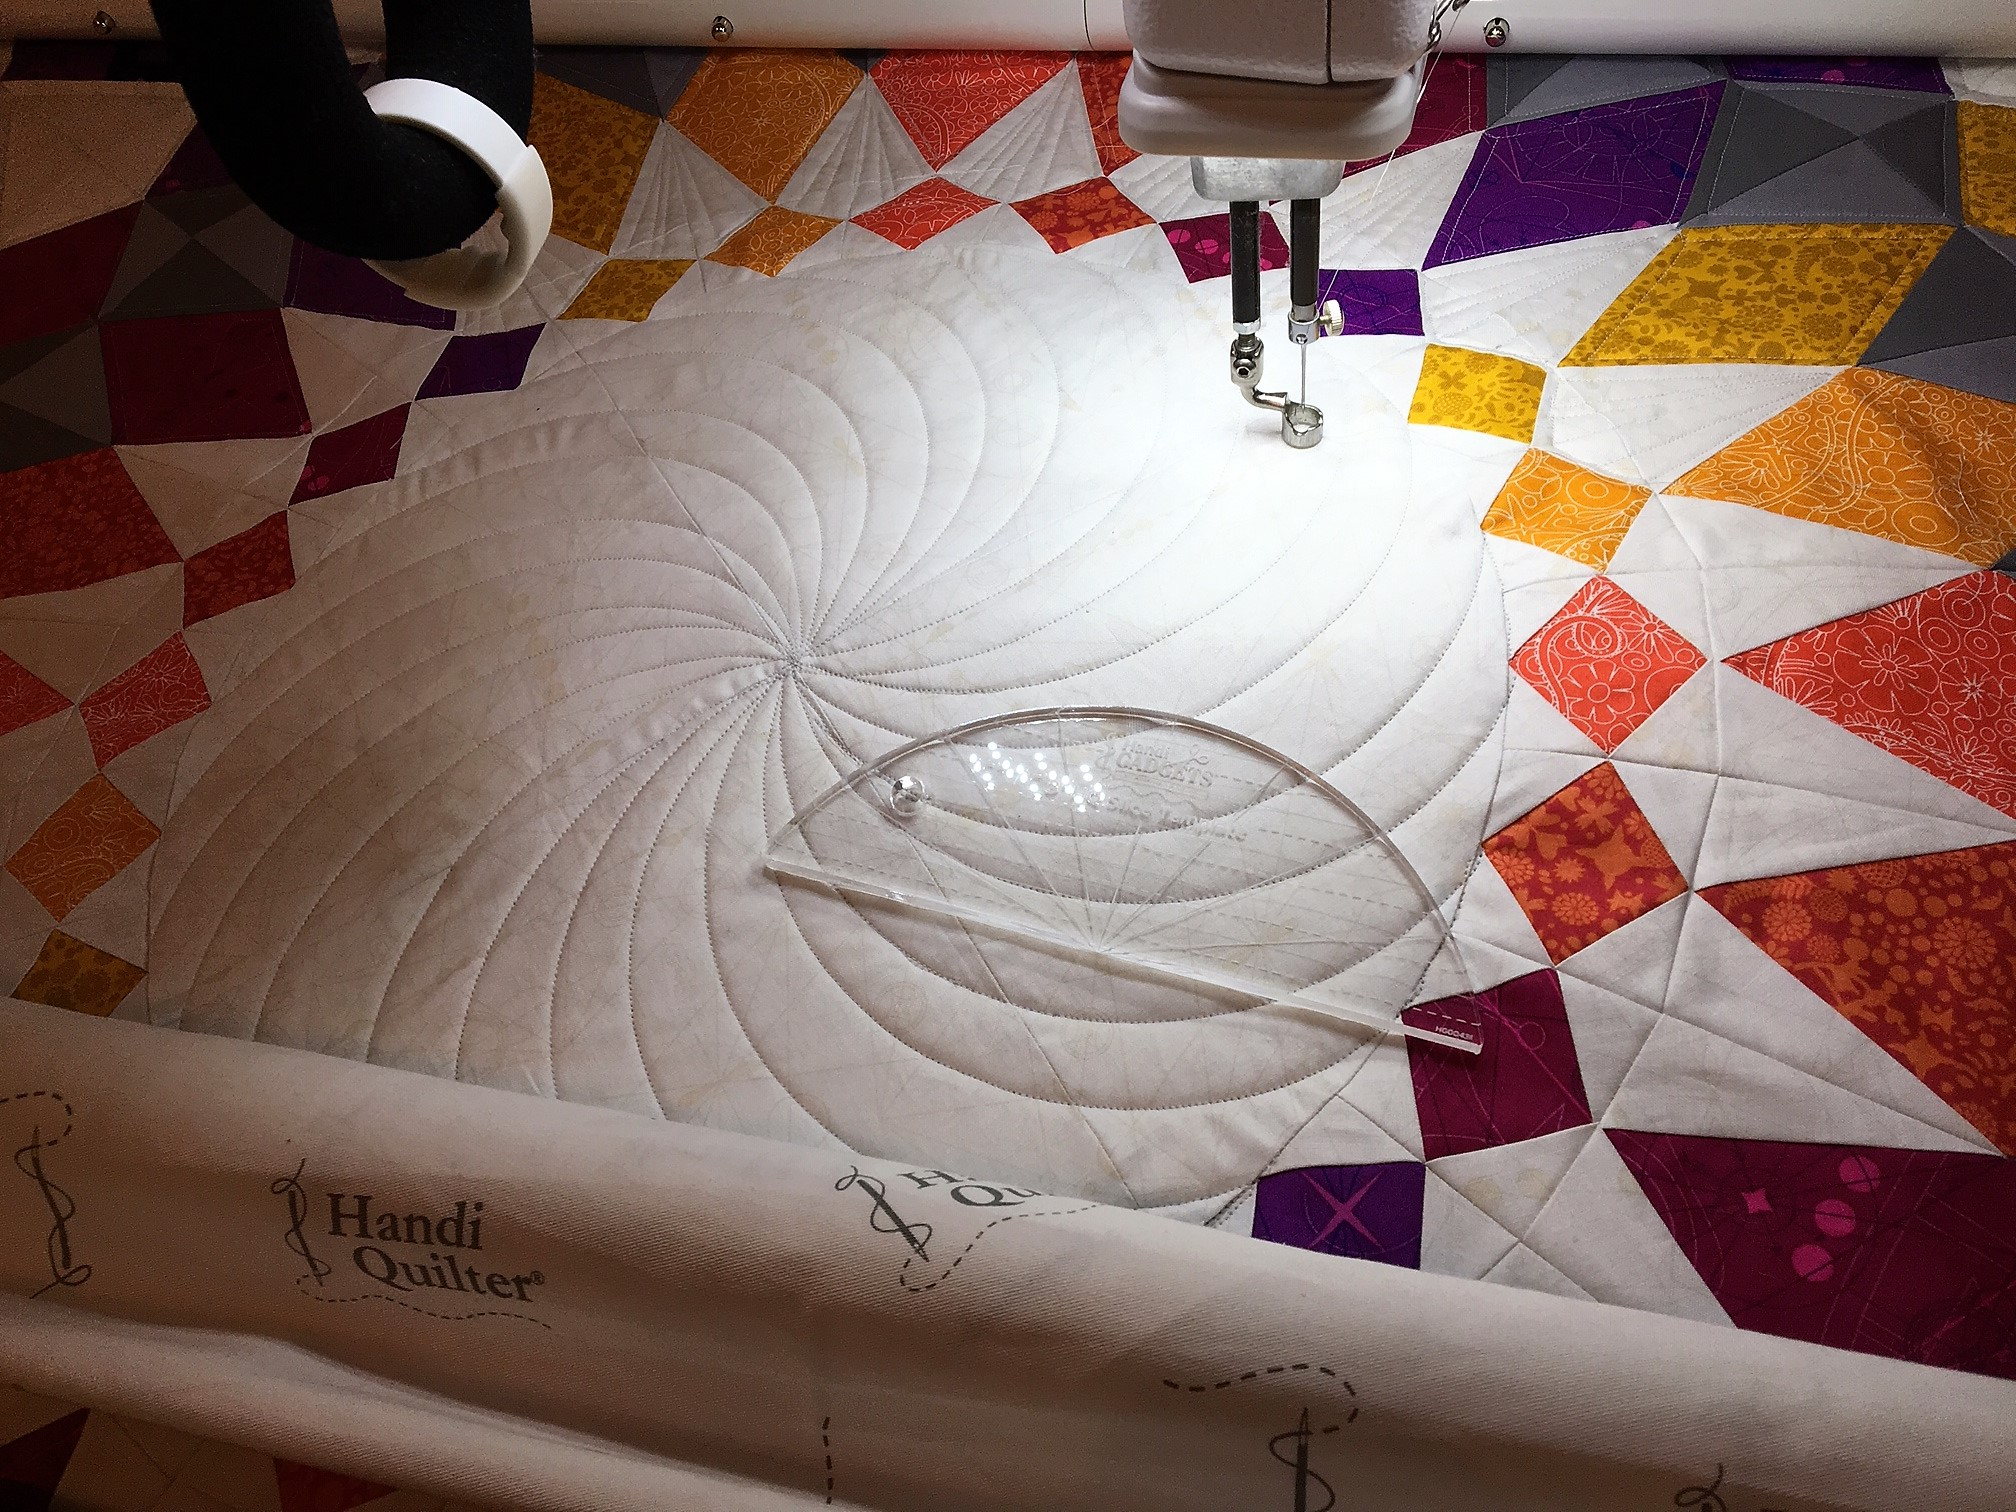 cc_halfcircle_rulerwork